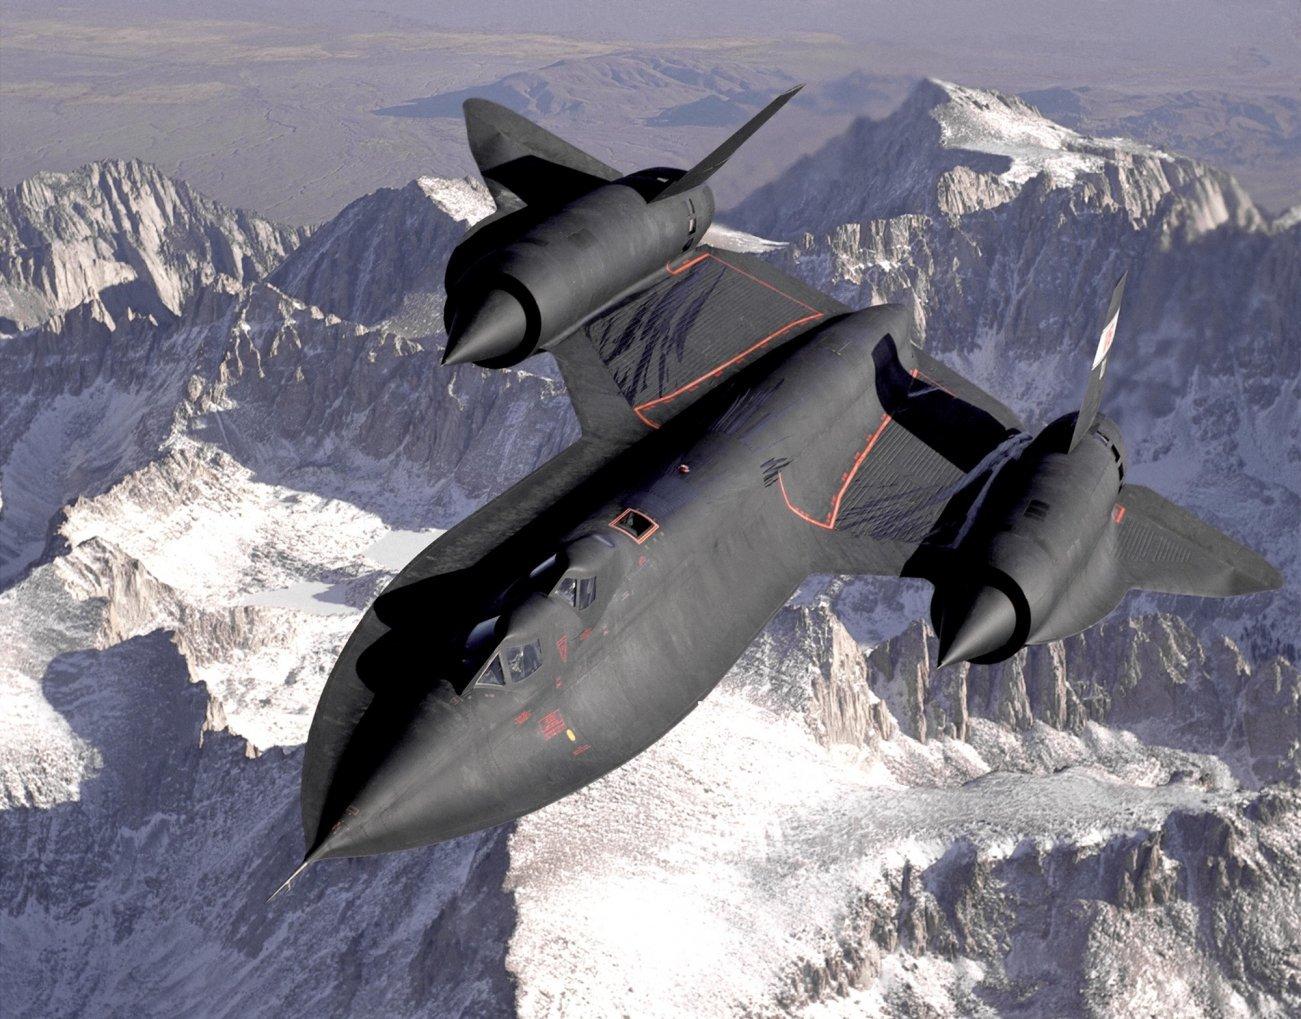 SR-71 Spy Plane: How the Fastest Plane on Earth Had One Fatal Flaw